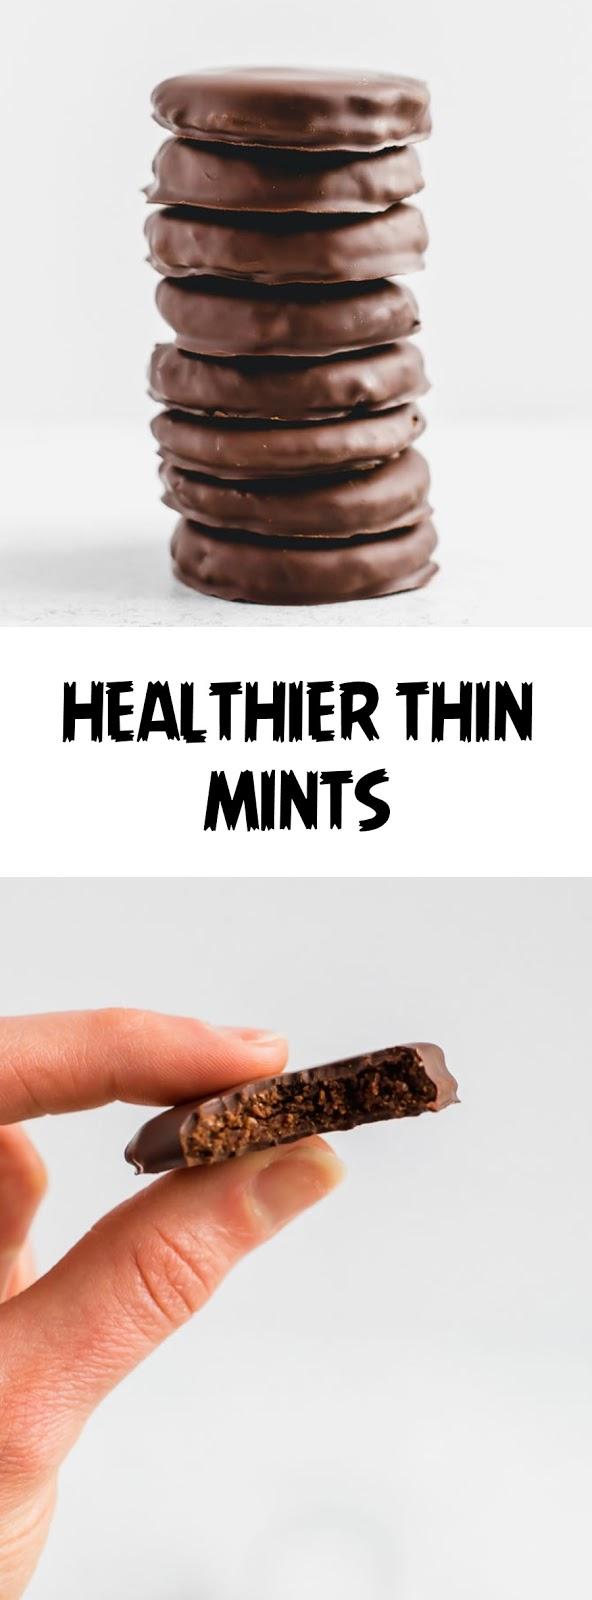 Healthier Thin Mints